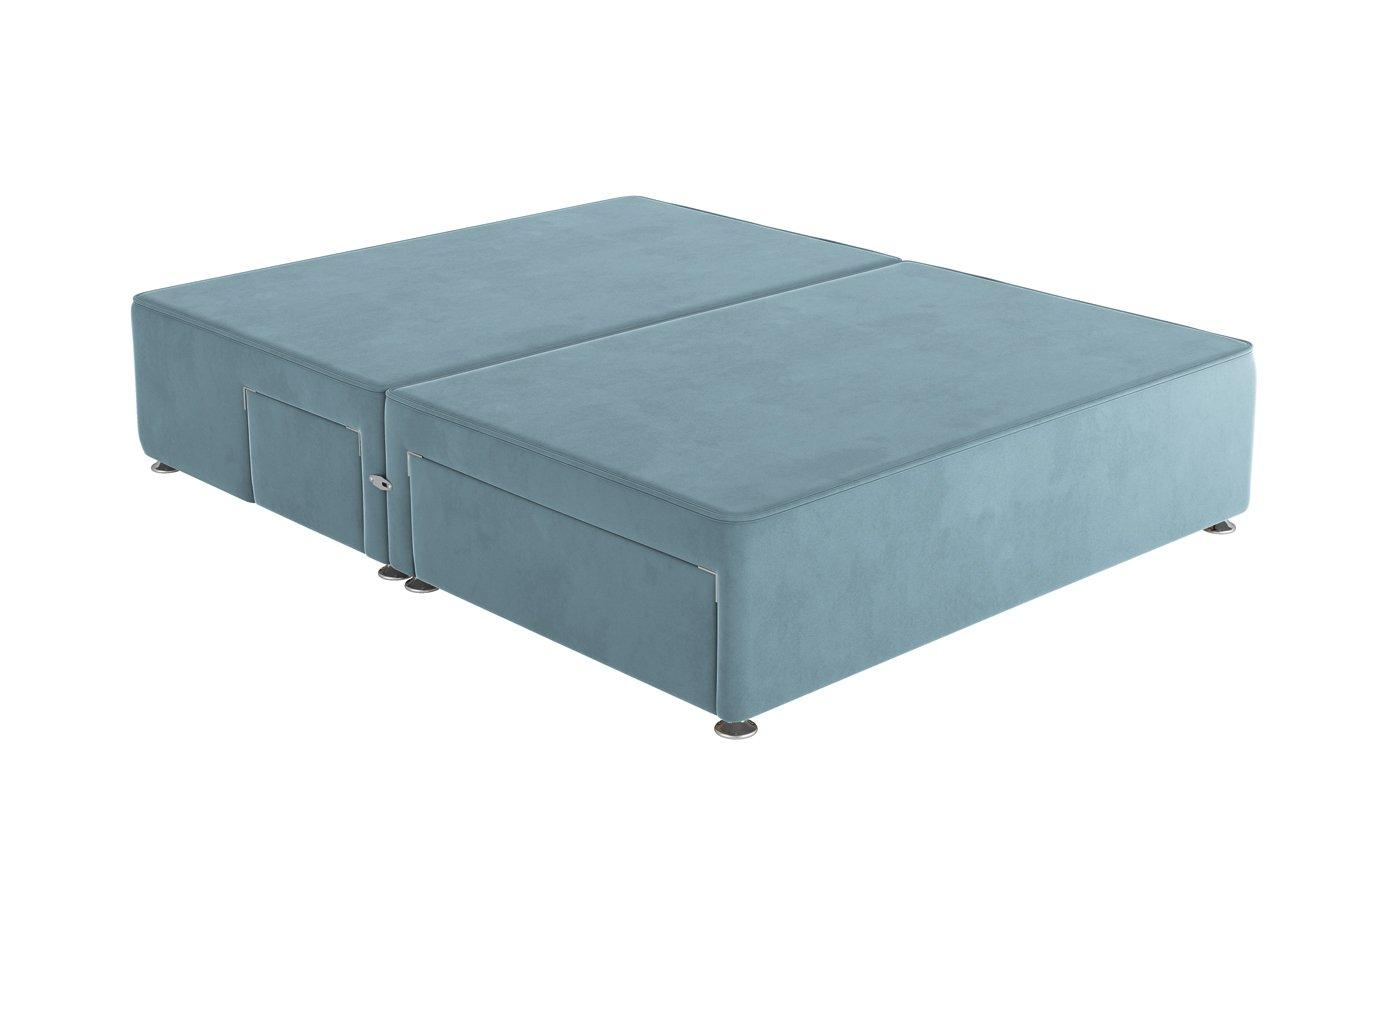 Sleepeezee D P/T 2+2 Drw Base Plush Sky 4'6 Double BLUE